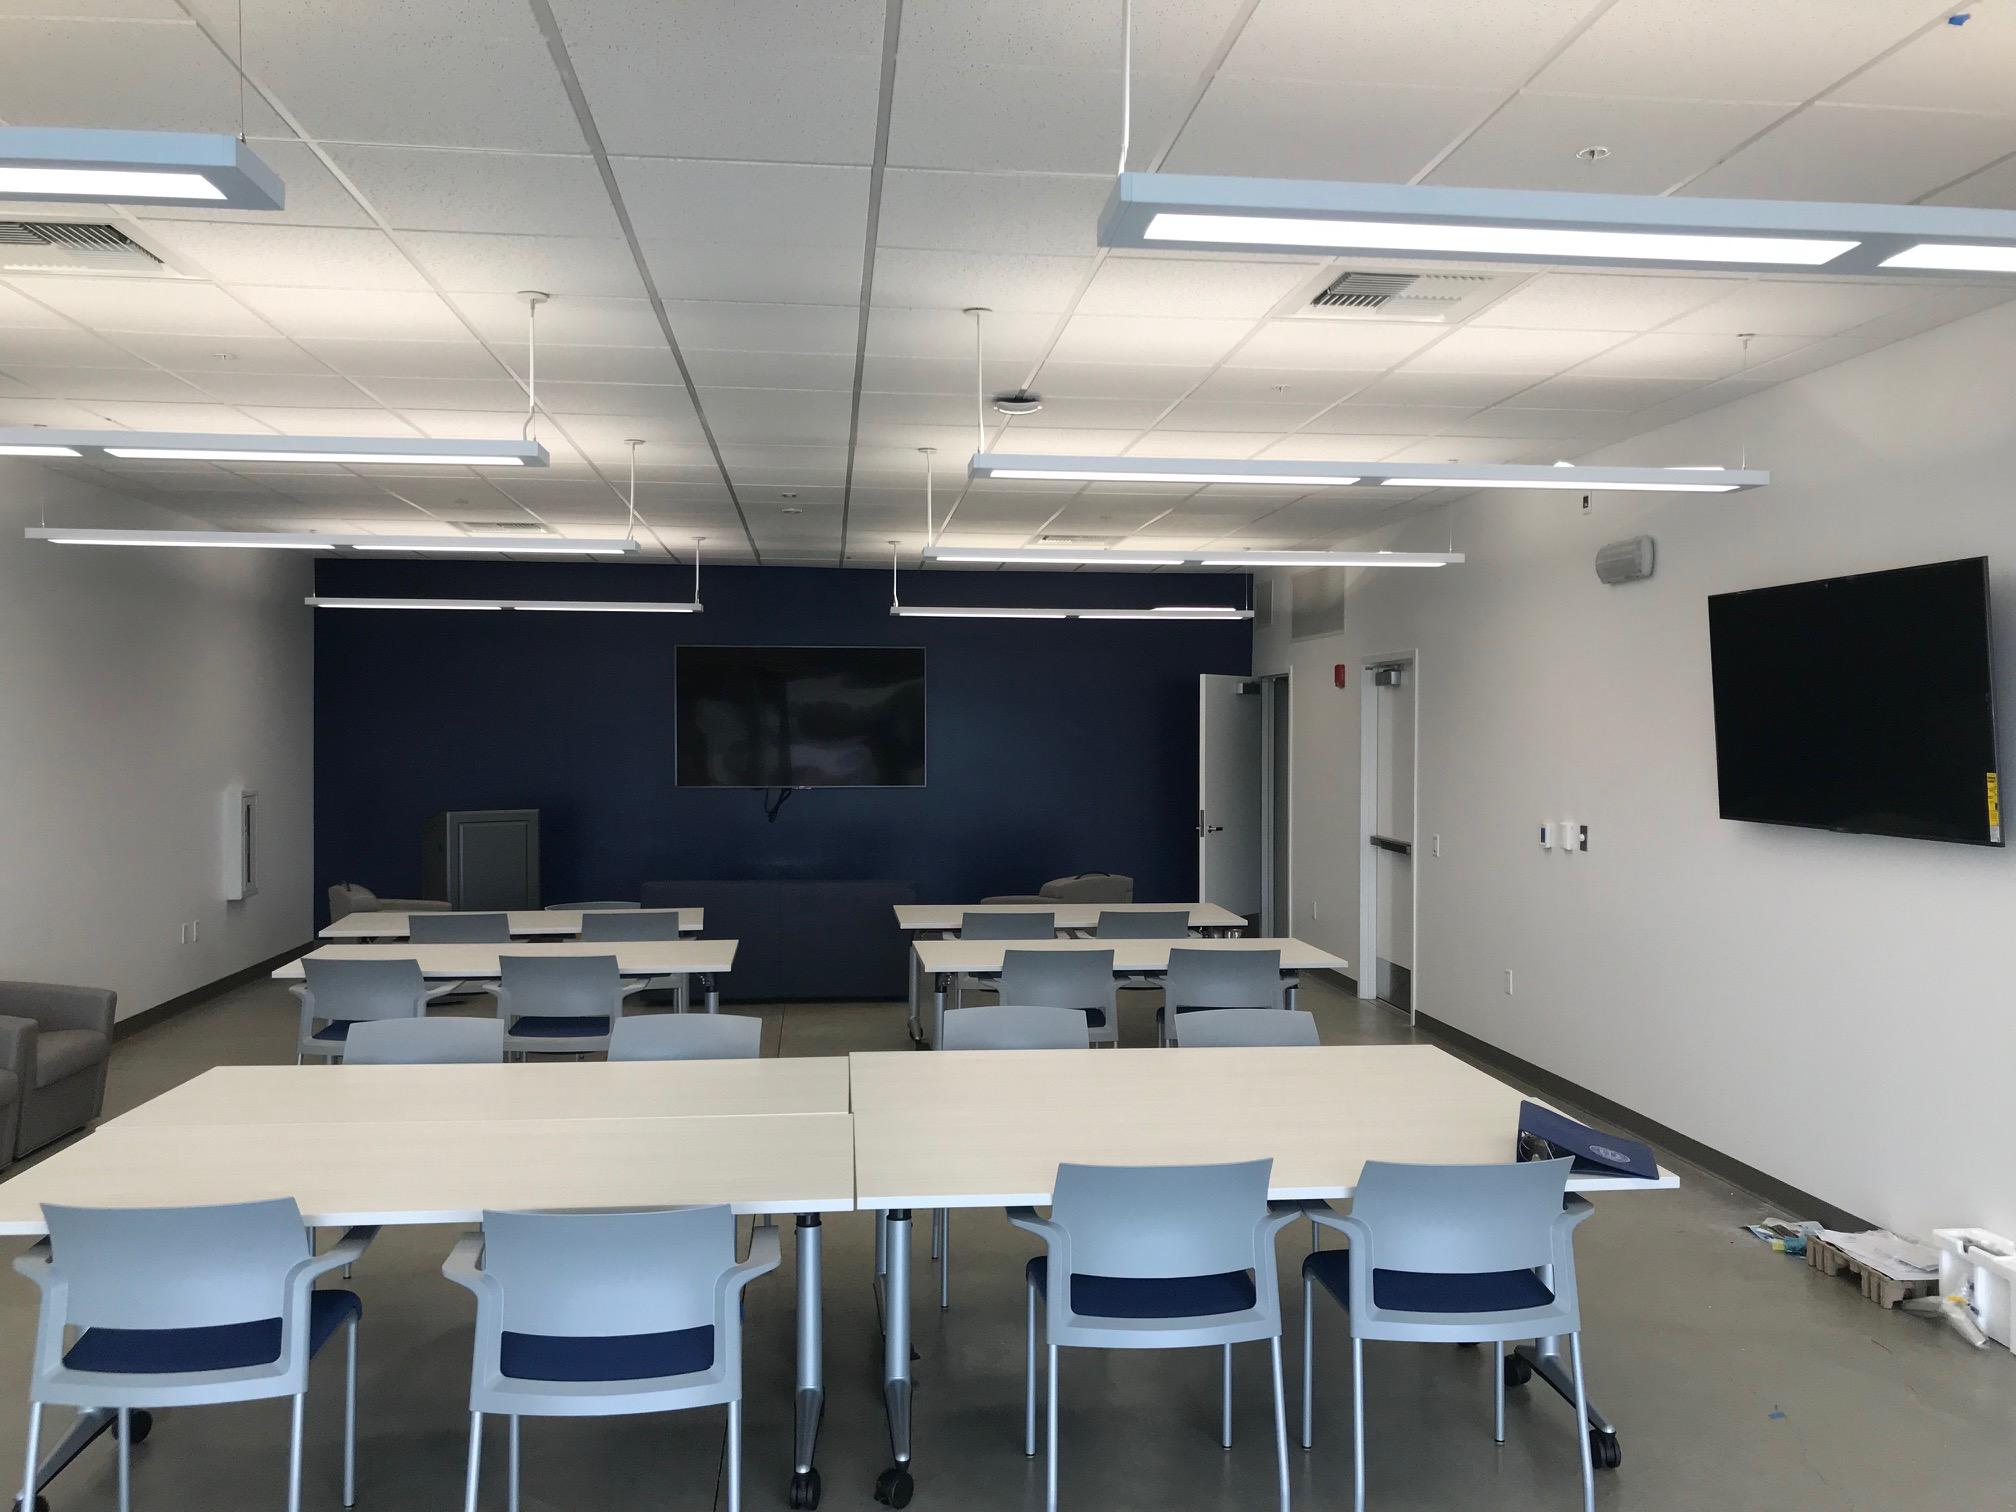 Interior Meeting